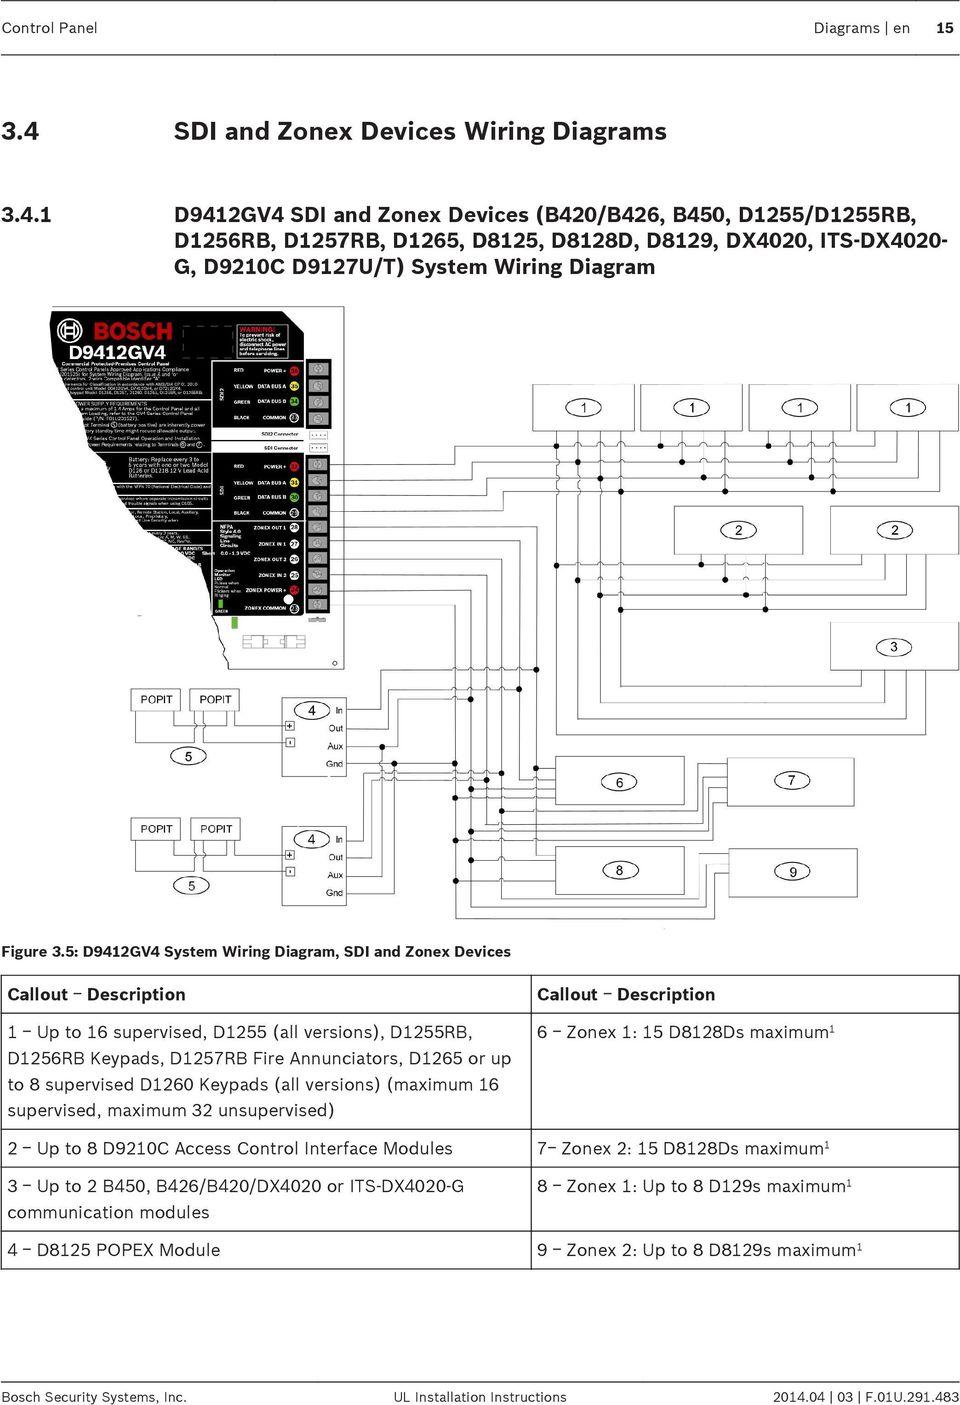 medium resolution of 1 d9412gv4 sdi and zonex devices b420 b426 b450 d1255 d1255rb